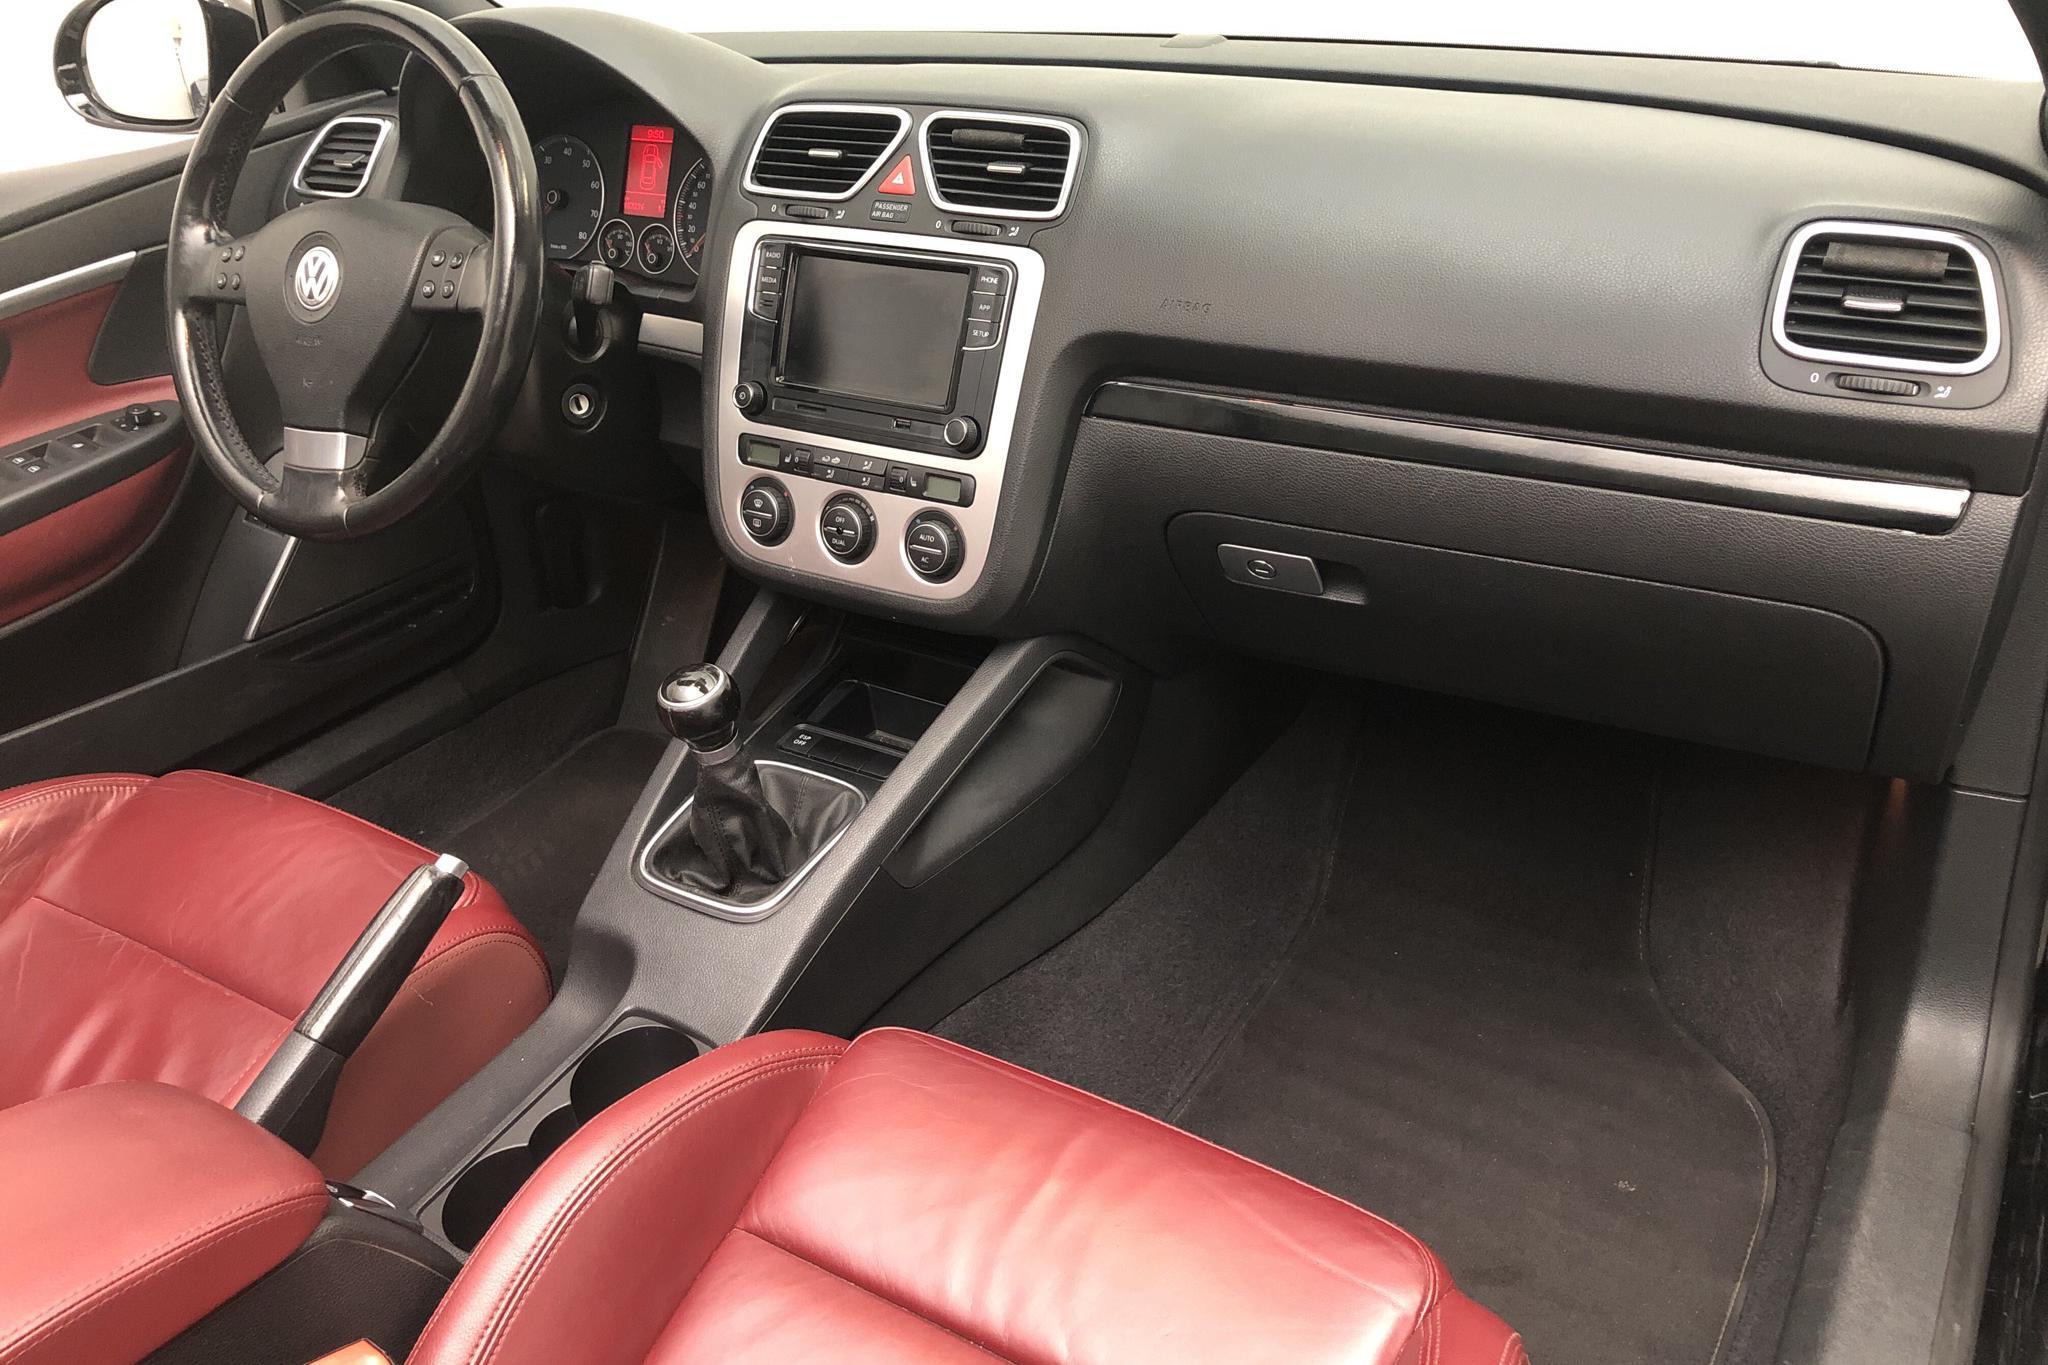 VW Eos 2.0 FSI Cabriolet (150hk) - 157 280 km - Manual - black - 2008